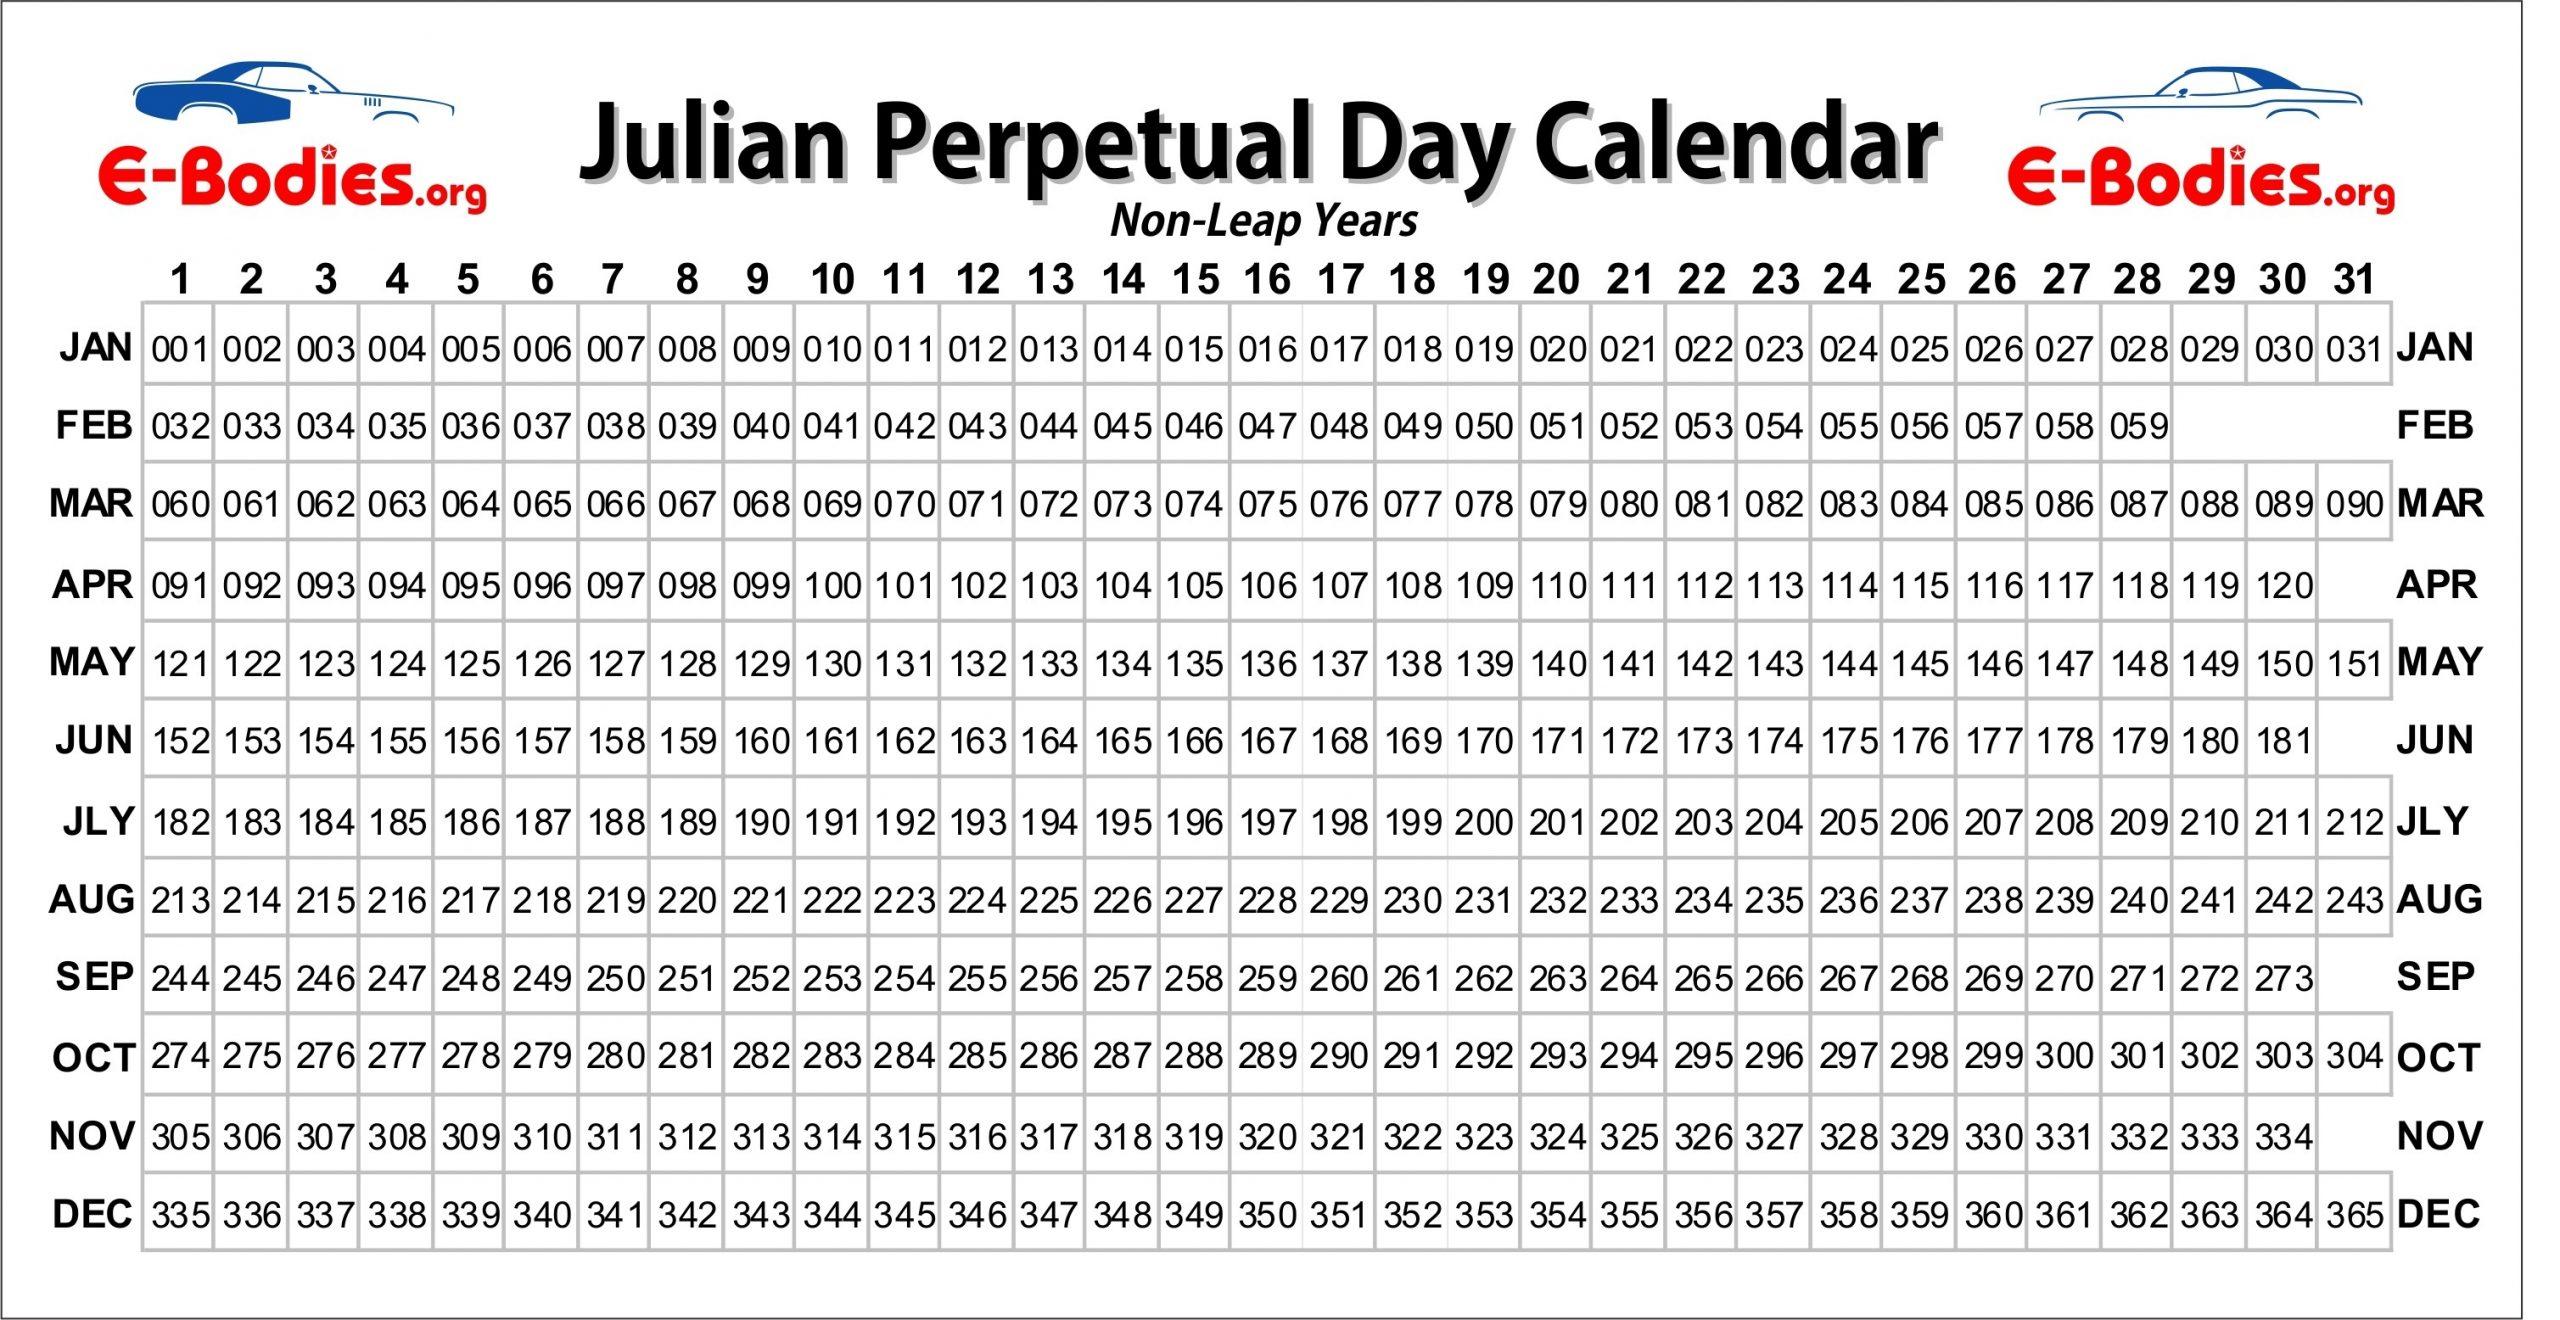 Mopar Julian Perpetual Day Calendar – E-Bodies  Julian Calendar